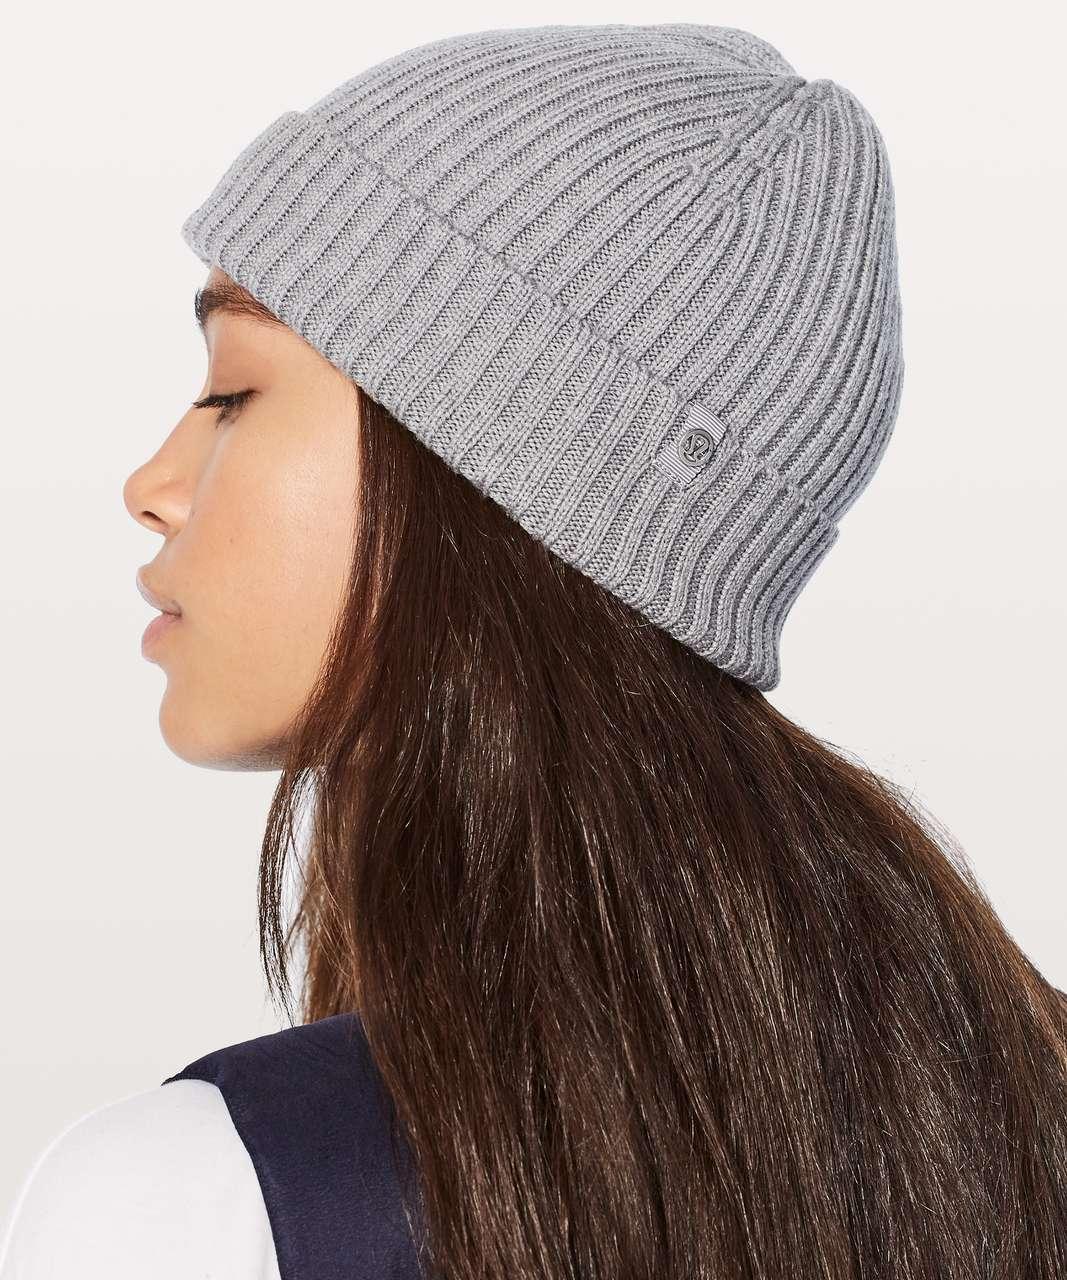 Lululemon Wool Be Cozy Toque - Heathered Medium Grey - lulu fanatics 8cf9891df61